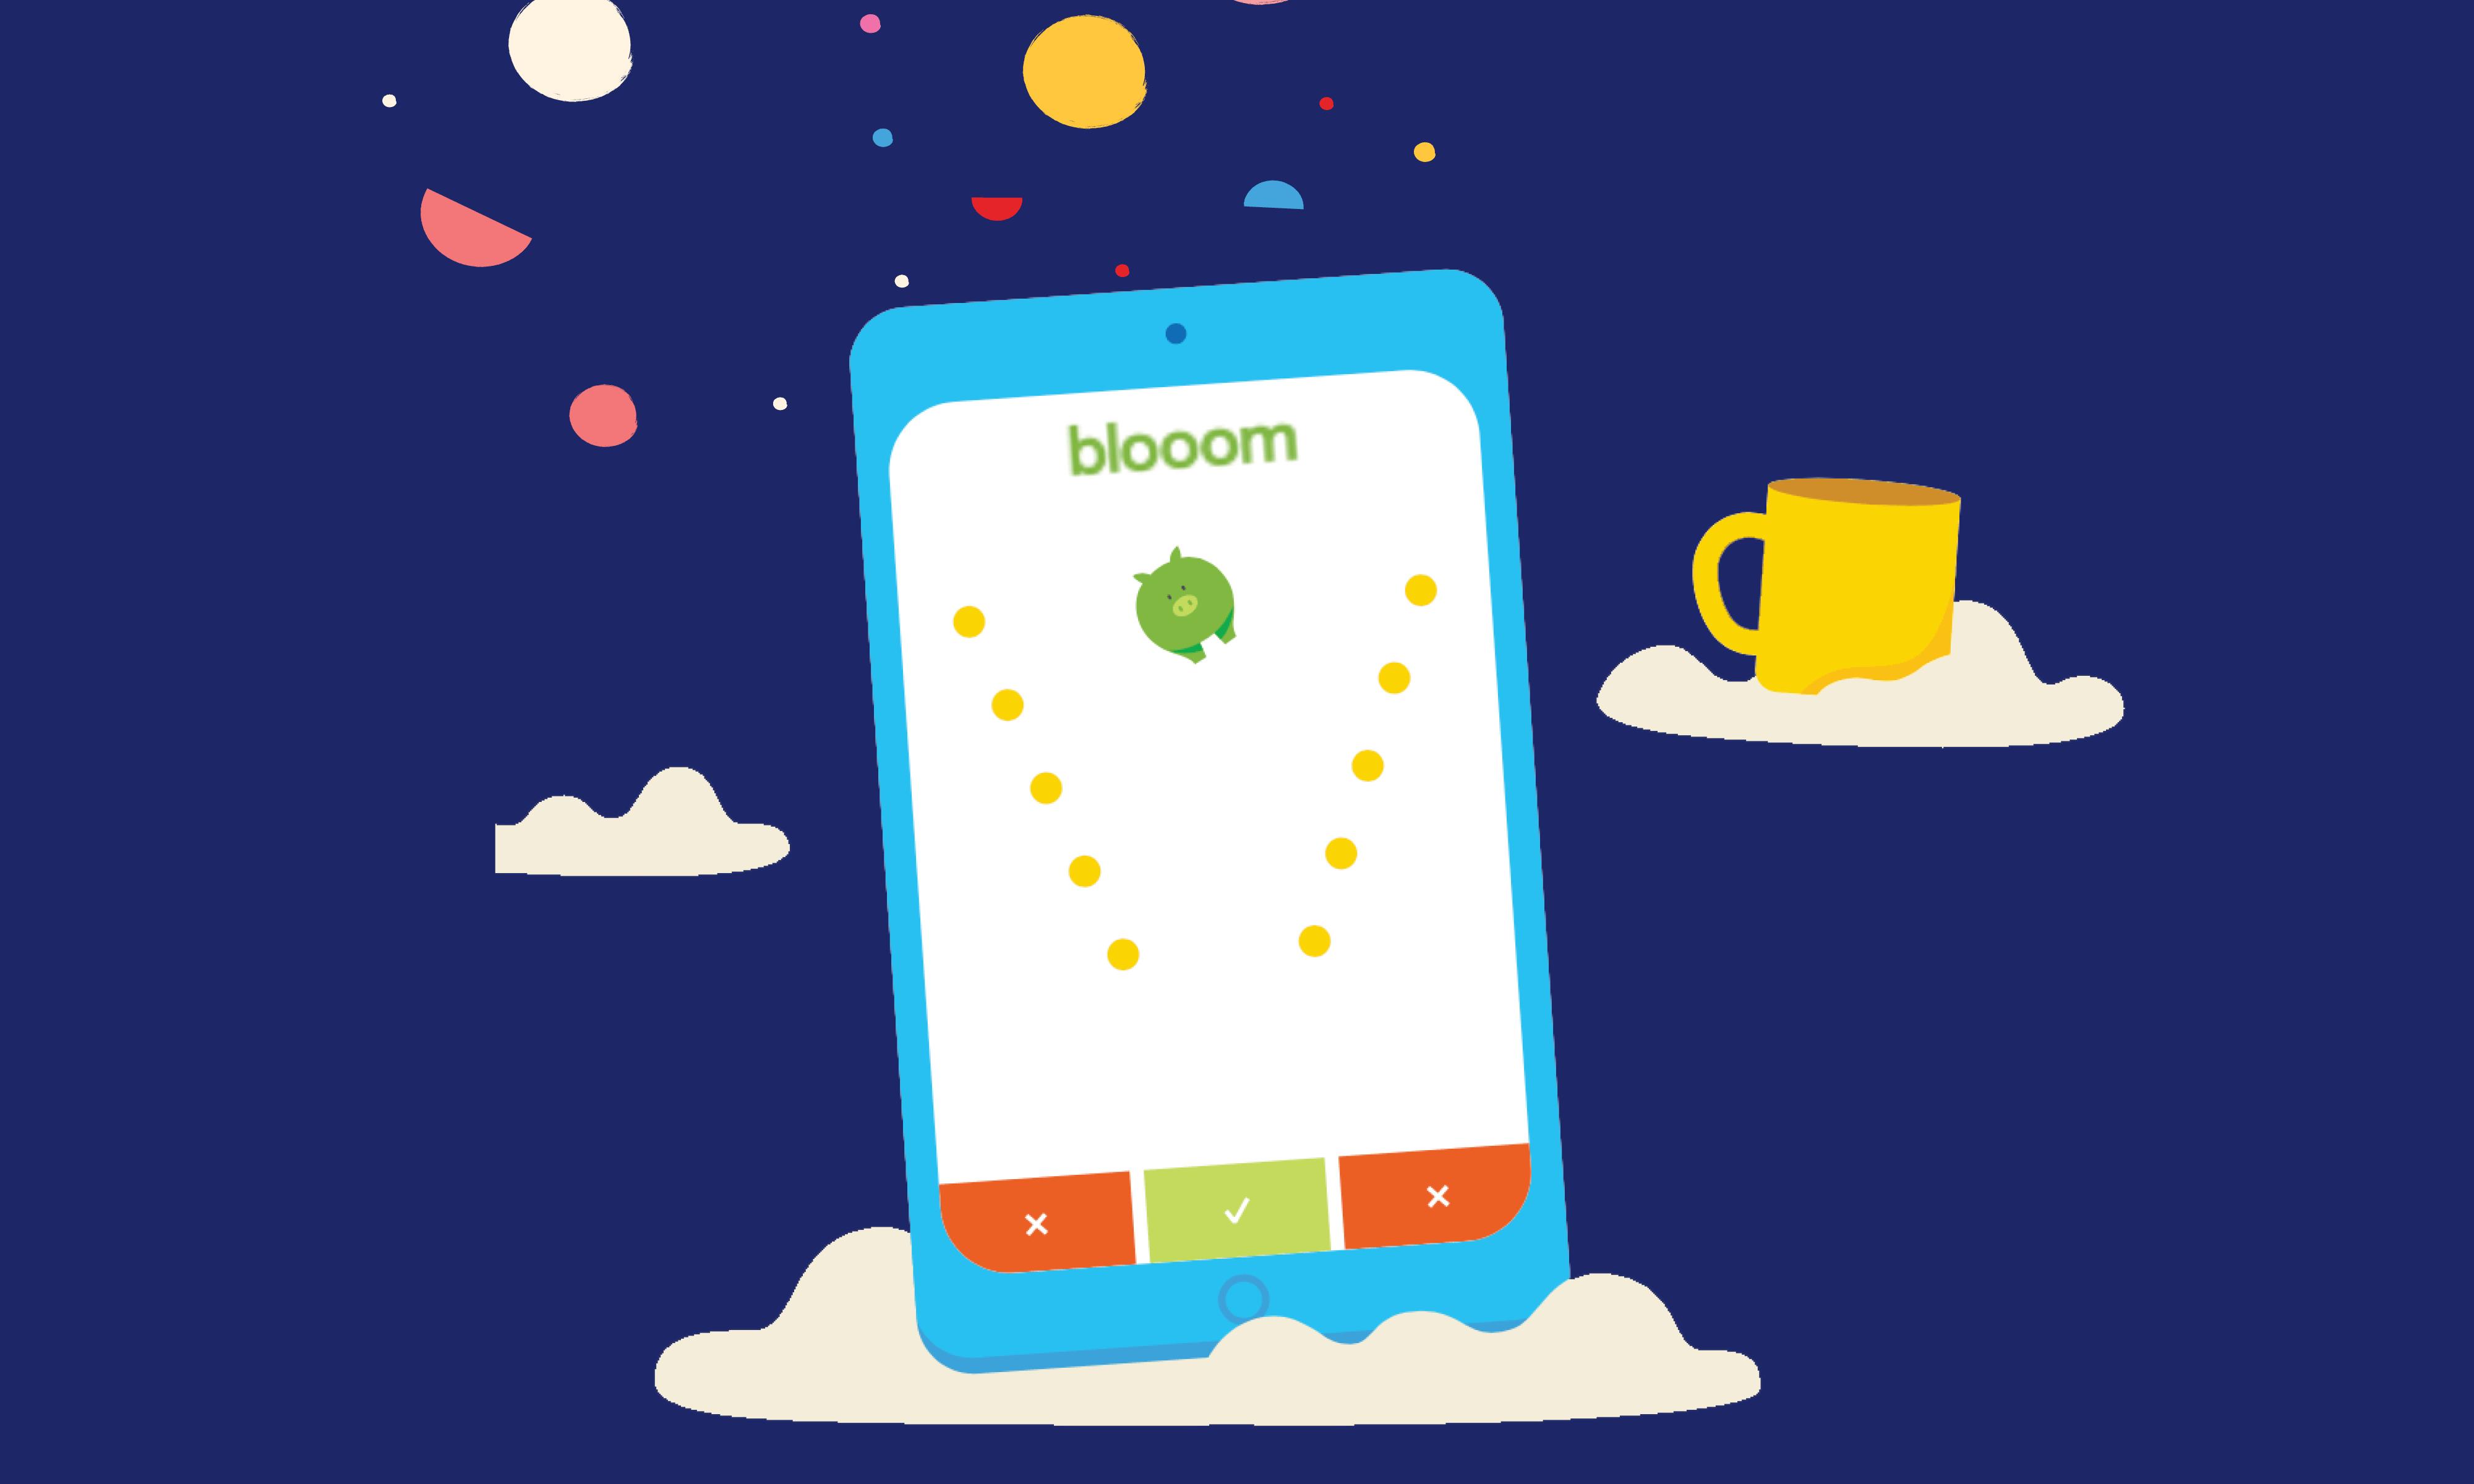 blooom-robo-advisor-review